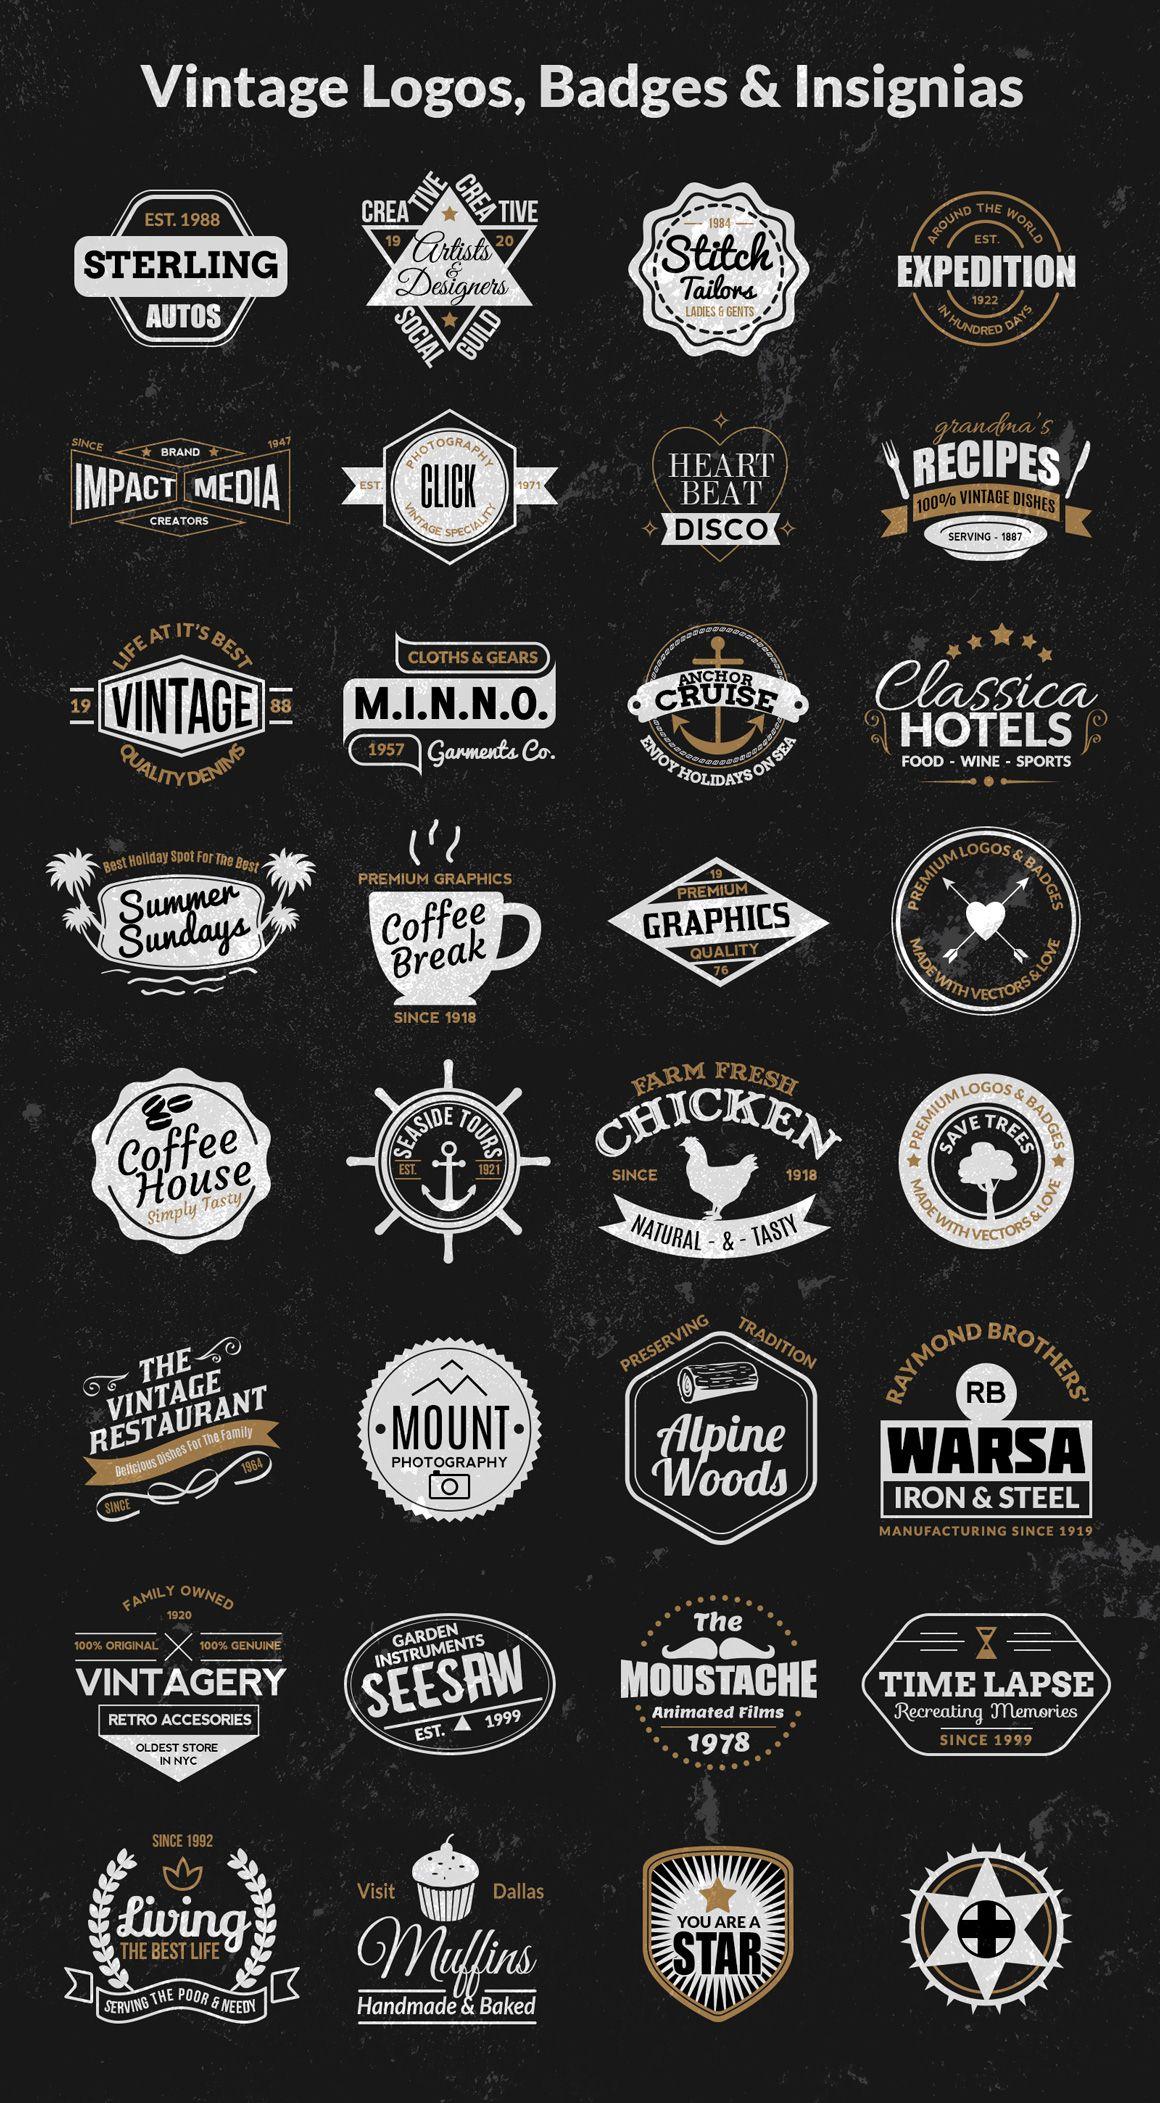 Vintage Logos Badges Insignias Kit Vol 1 Graphicsfuel Vintage Logo Design Retro Logo Design Logo Design Inspiration Vintage